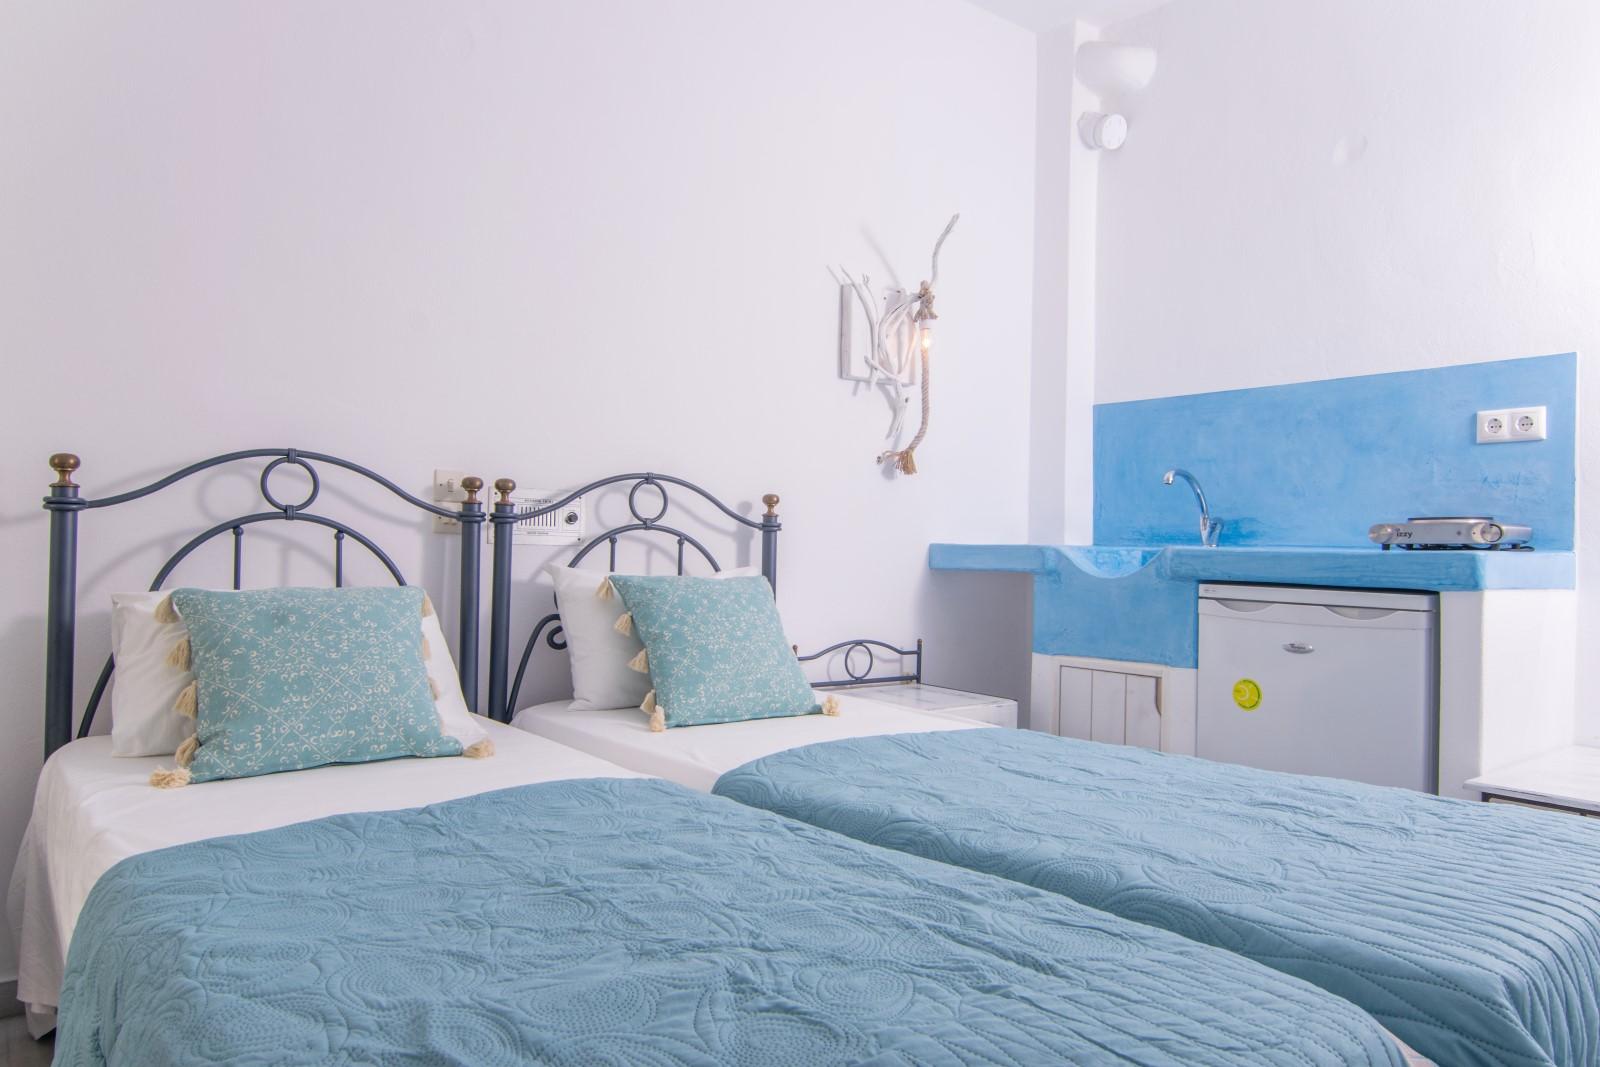 studios-naxos-irene-standard twin room-ok